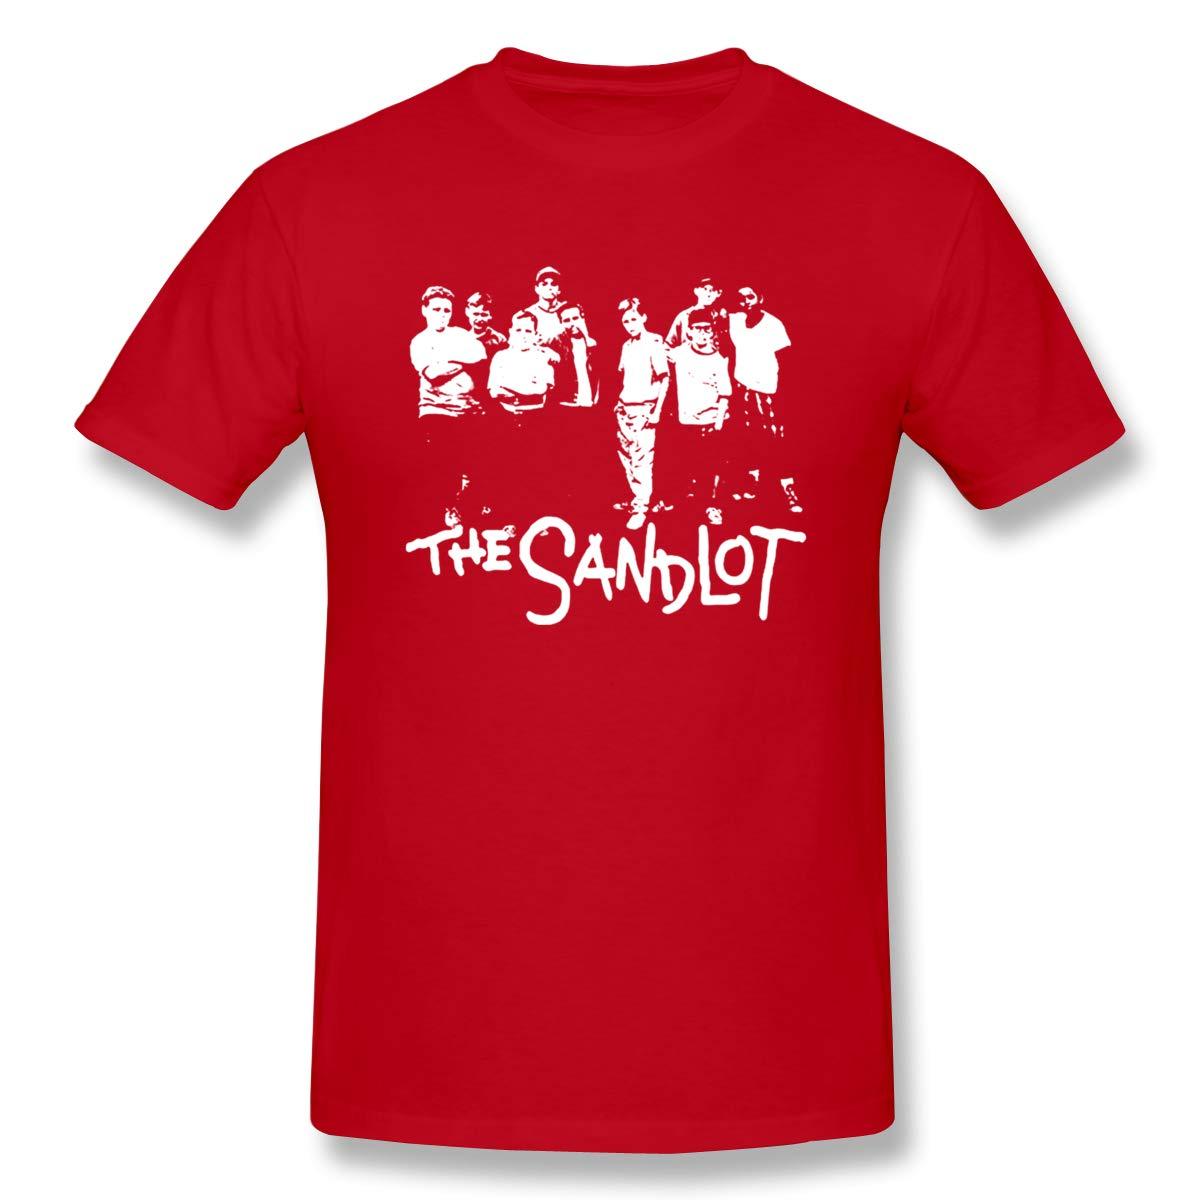 The Sandlot S Team Graphic Tshirt